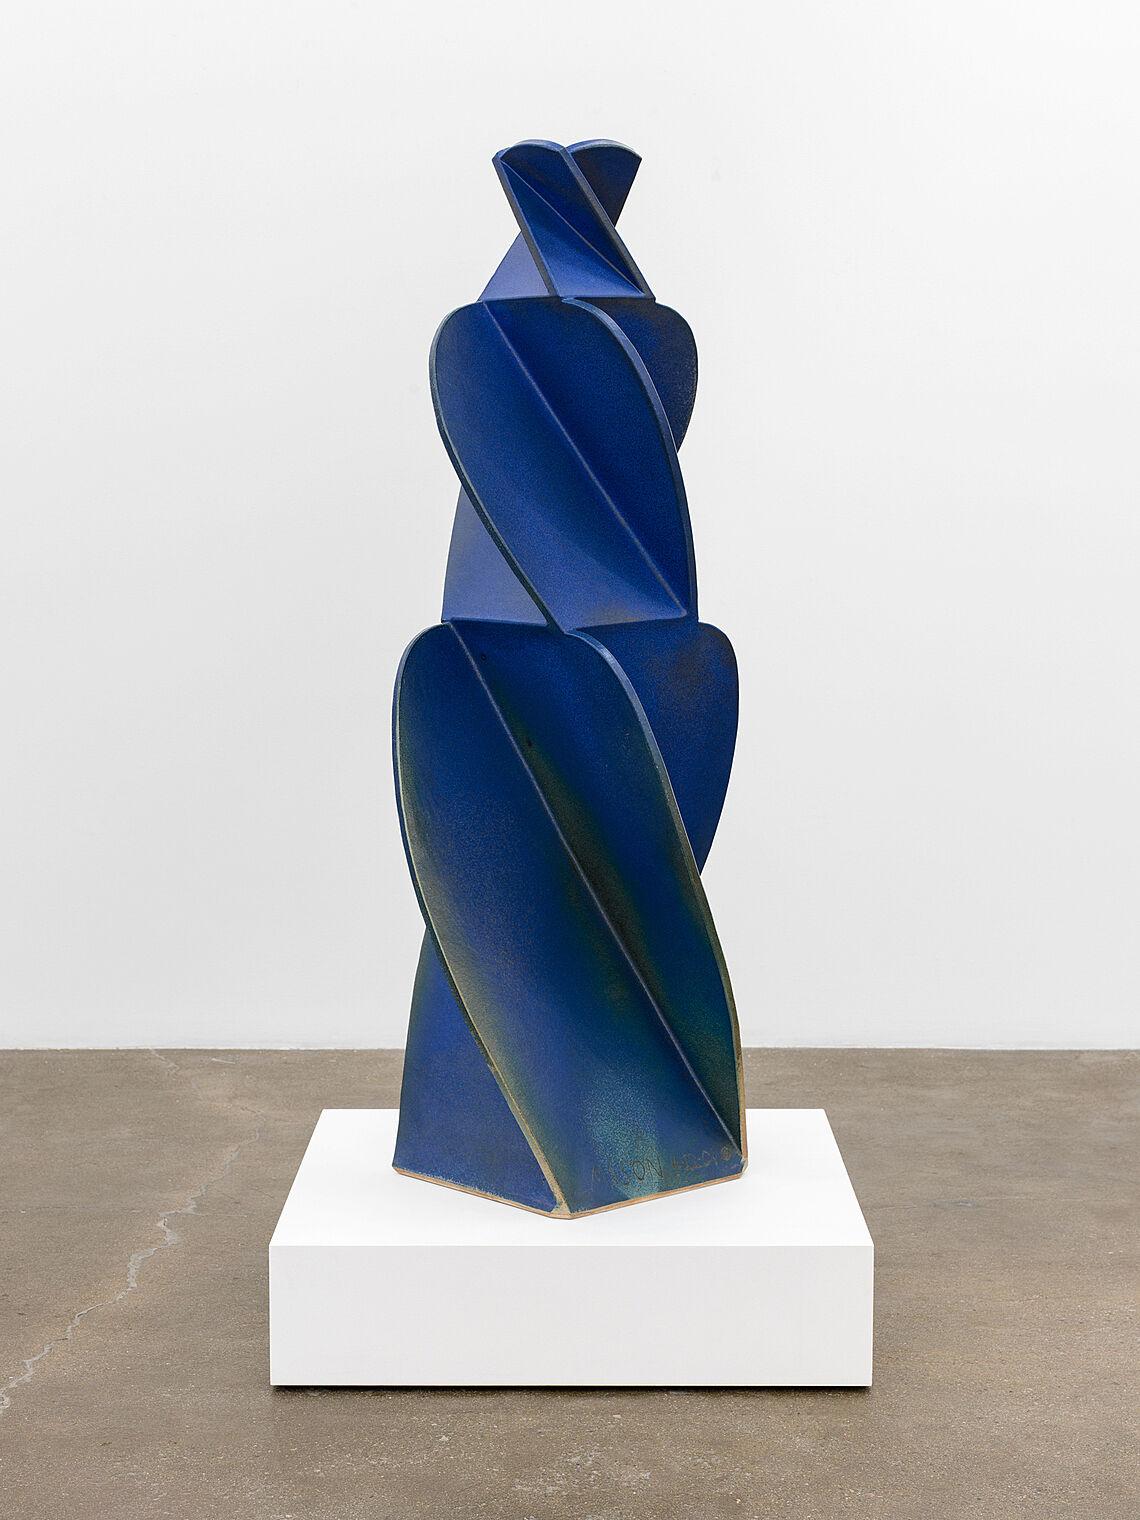 A tall blue ceramic artwork.